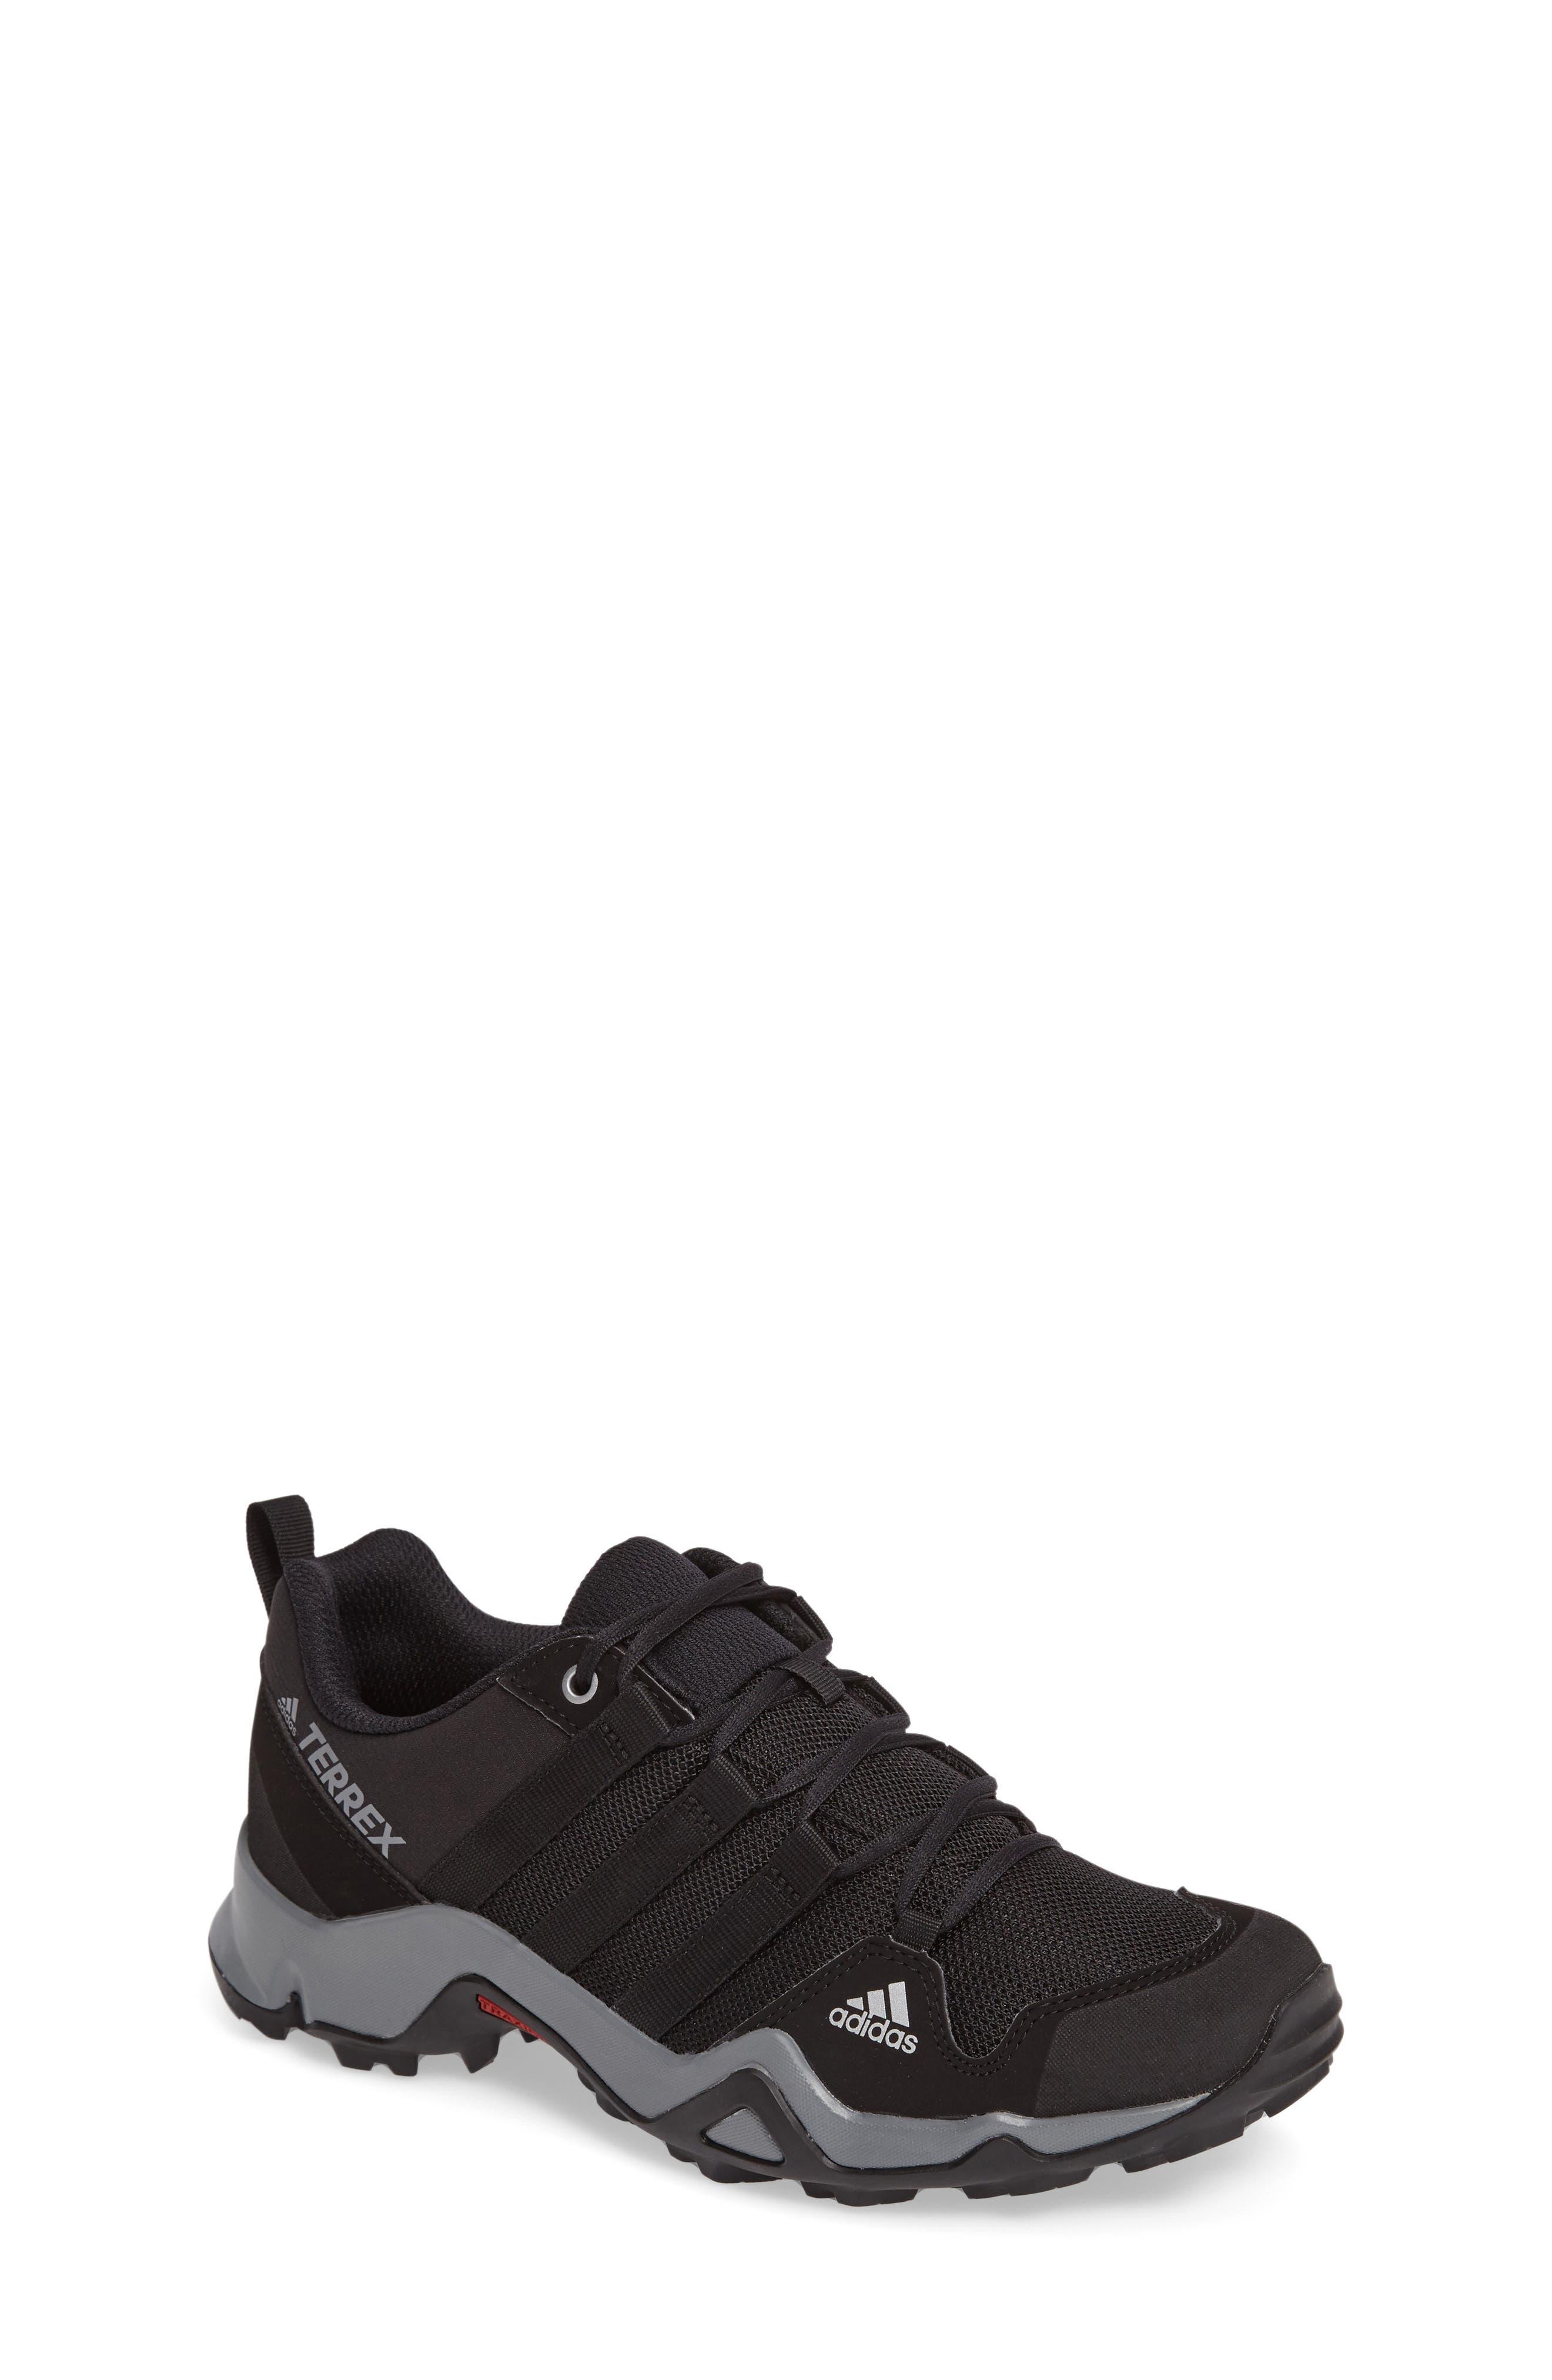 Main Image - adidas Terrex AX2R Hiking Shoe (Toddler, Little Kid & Big Kid)